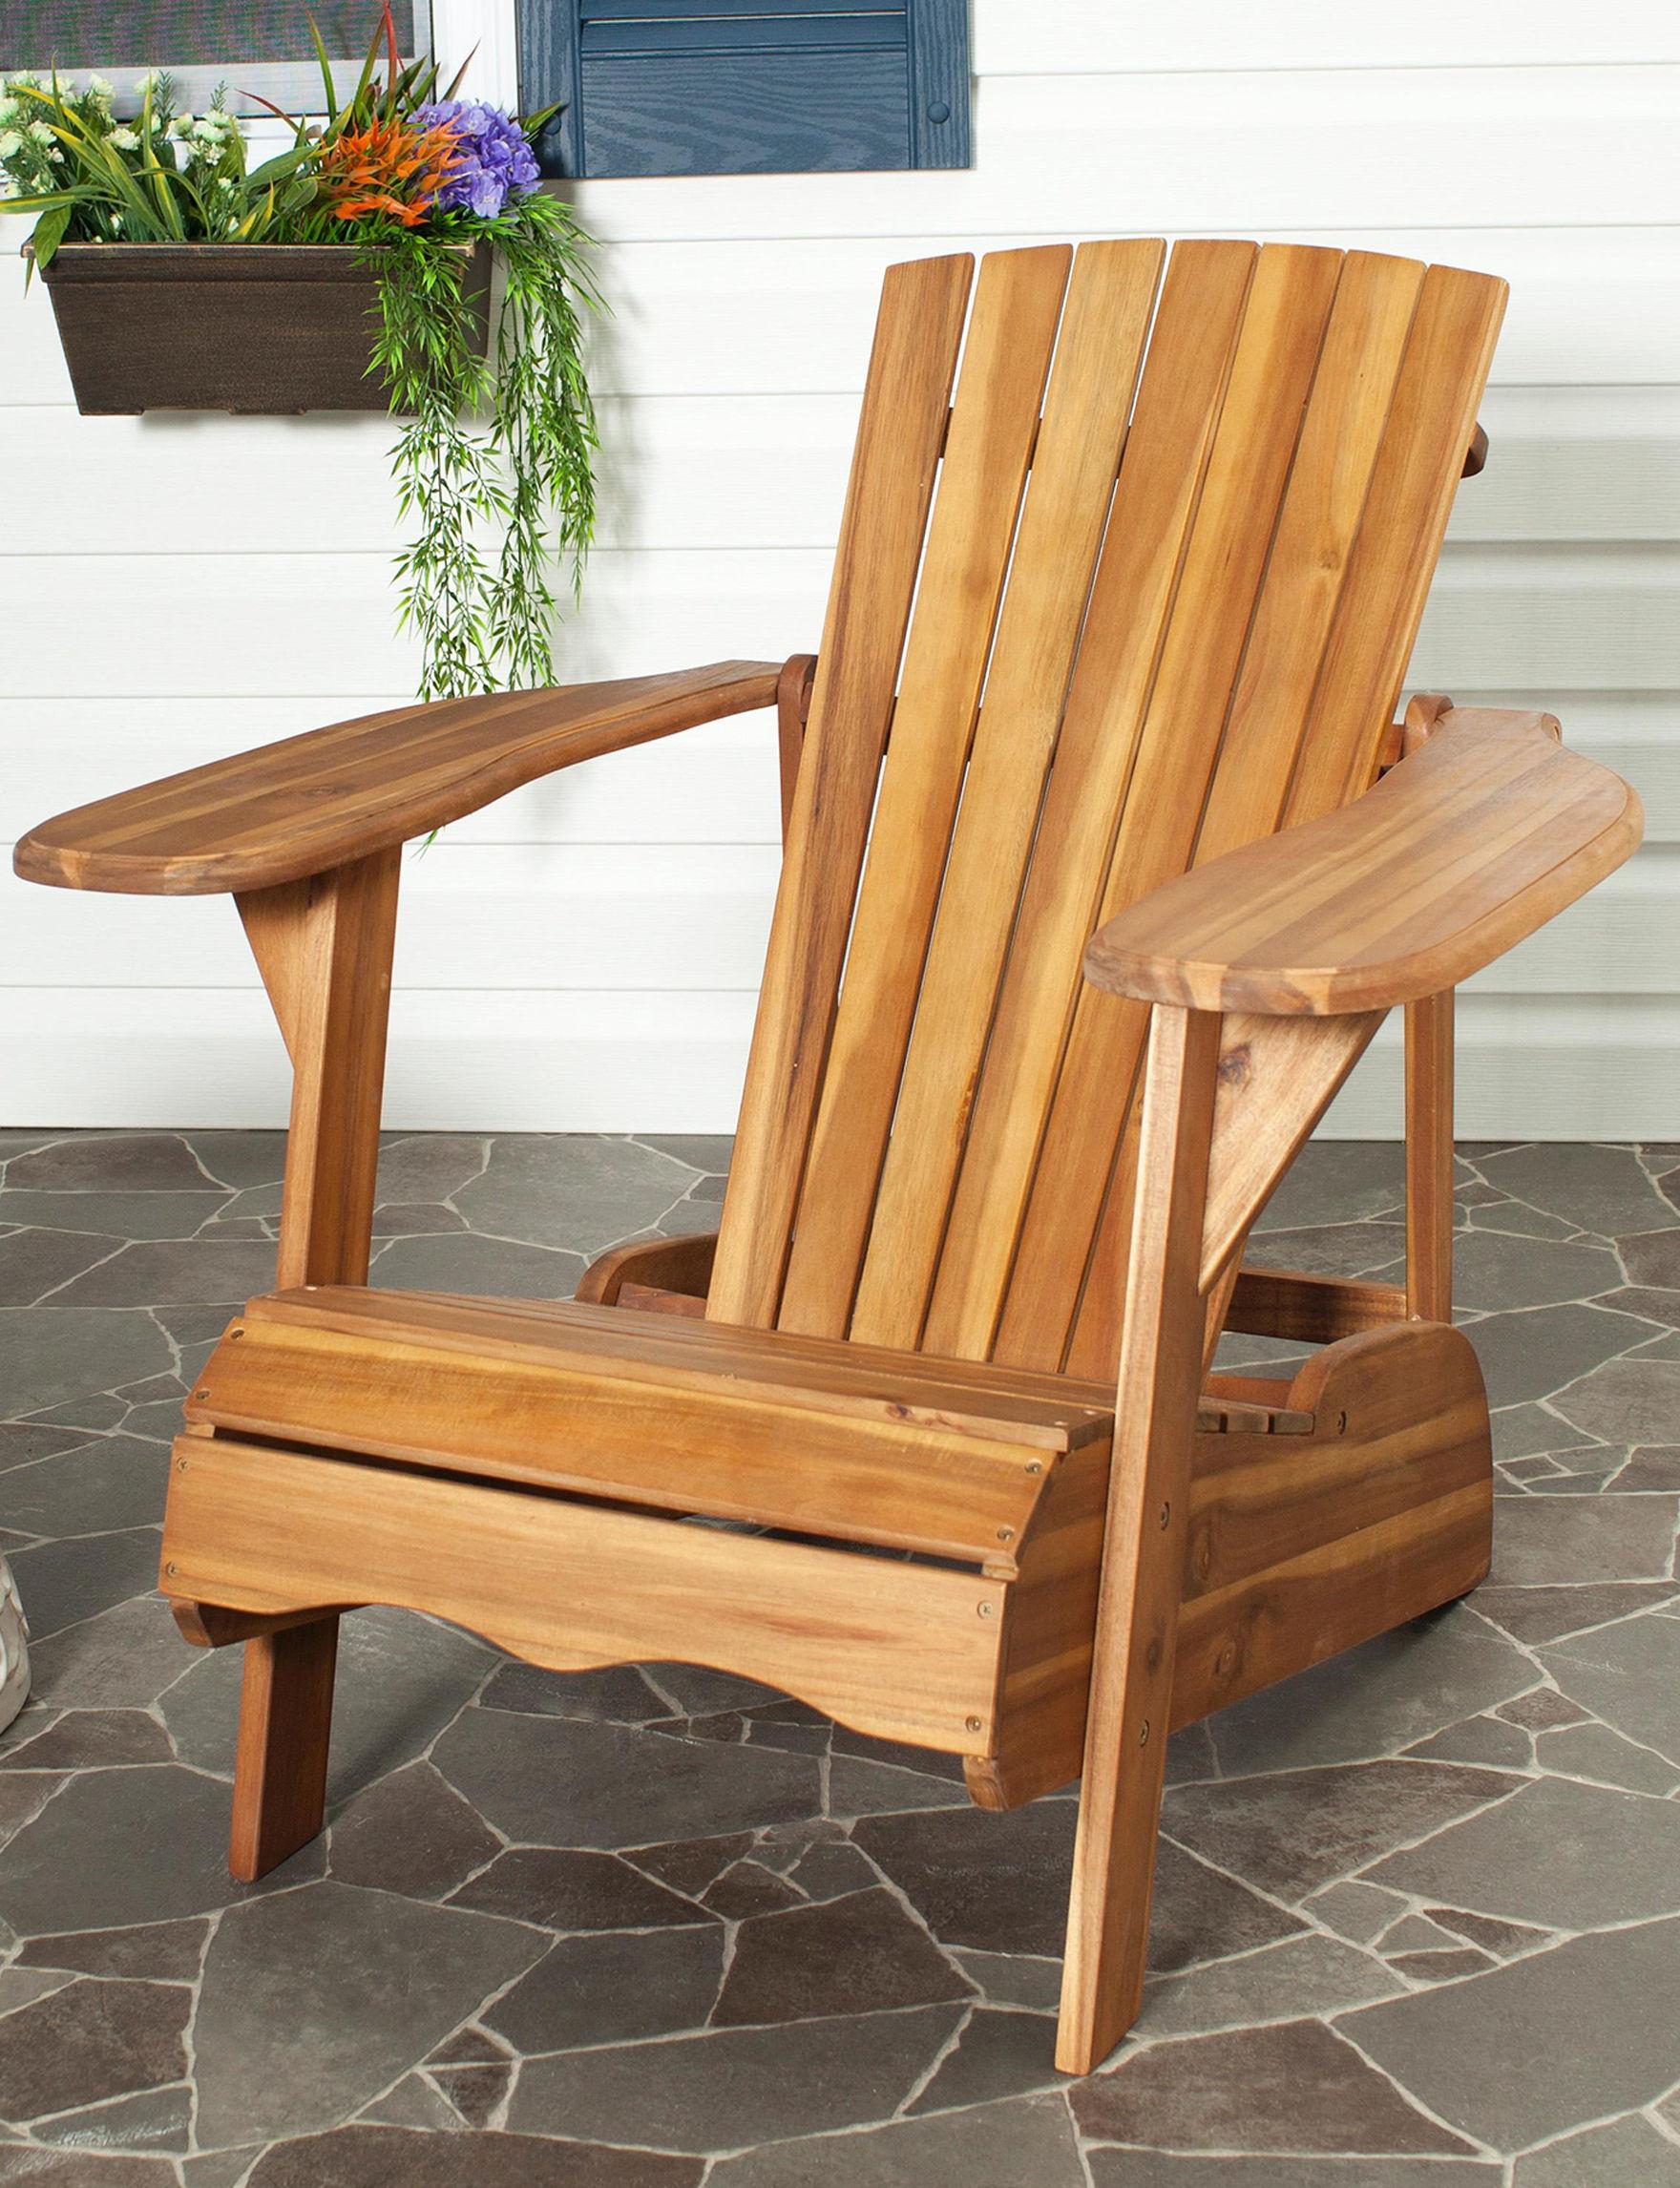 Safavieh Natural Patio & Outdoor Furniture